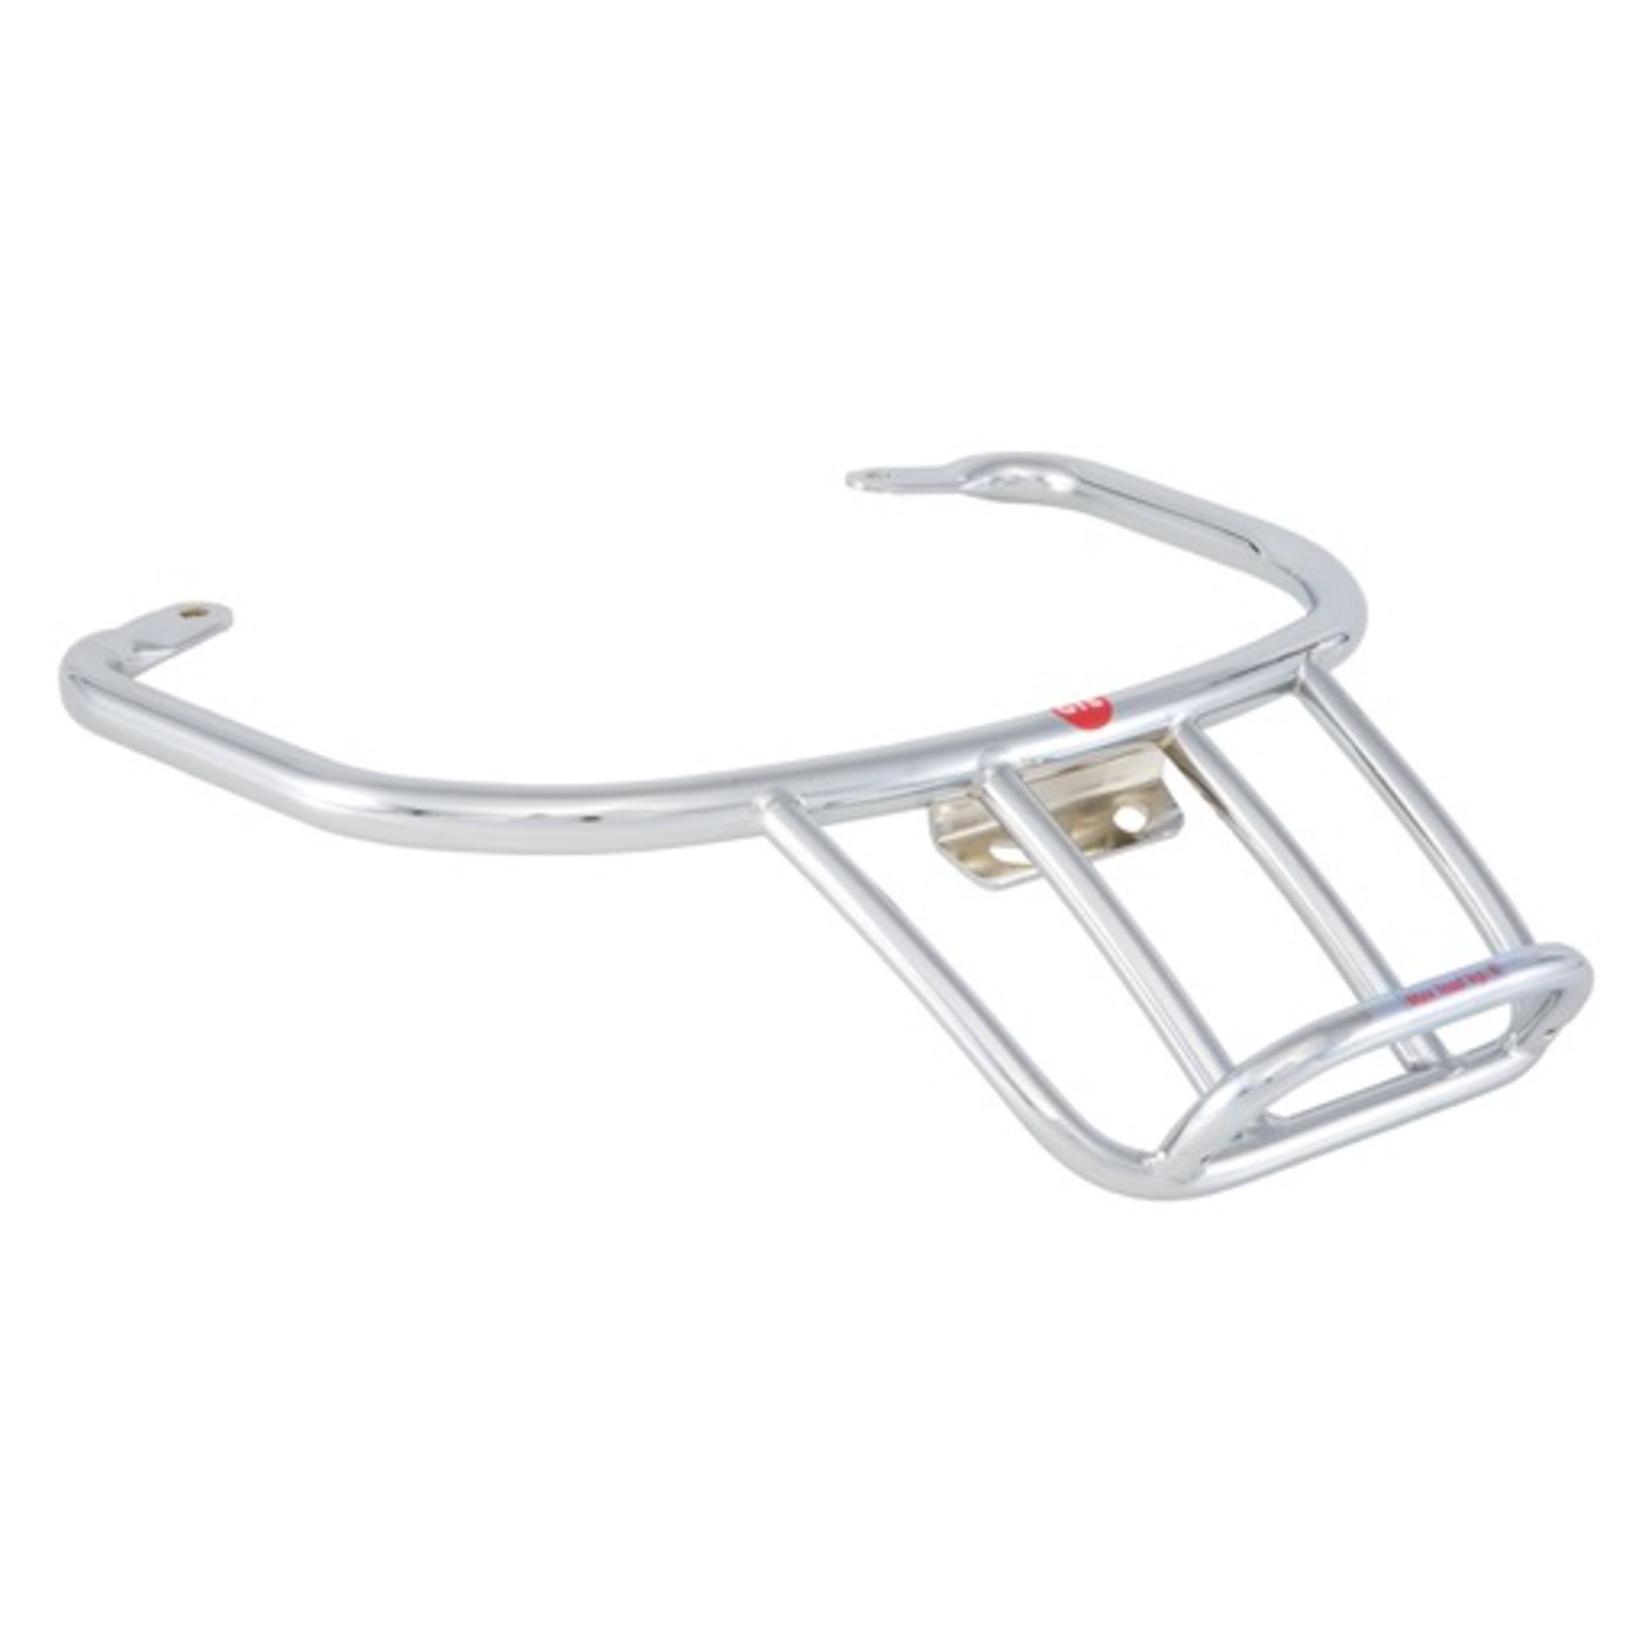 Accessories Rack, Primavera/Sprint 70's Grab Handle Luggage Rack Chrome